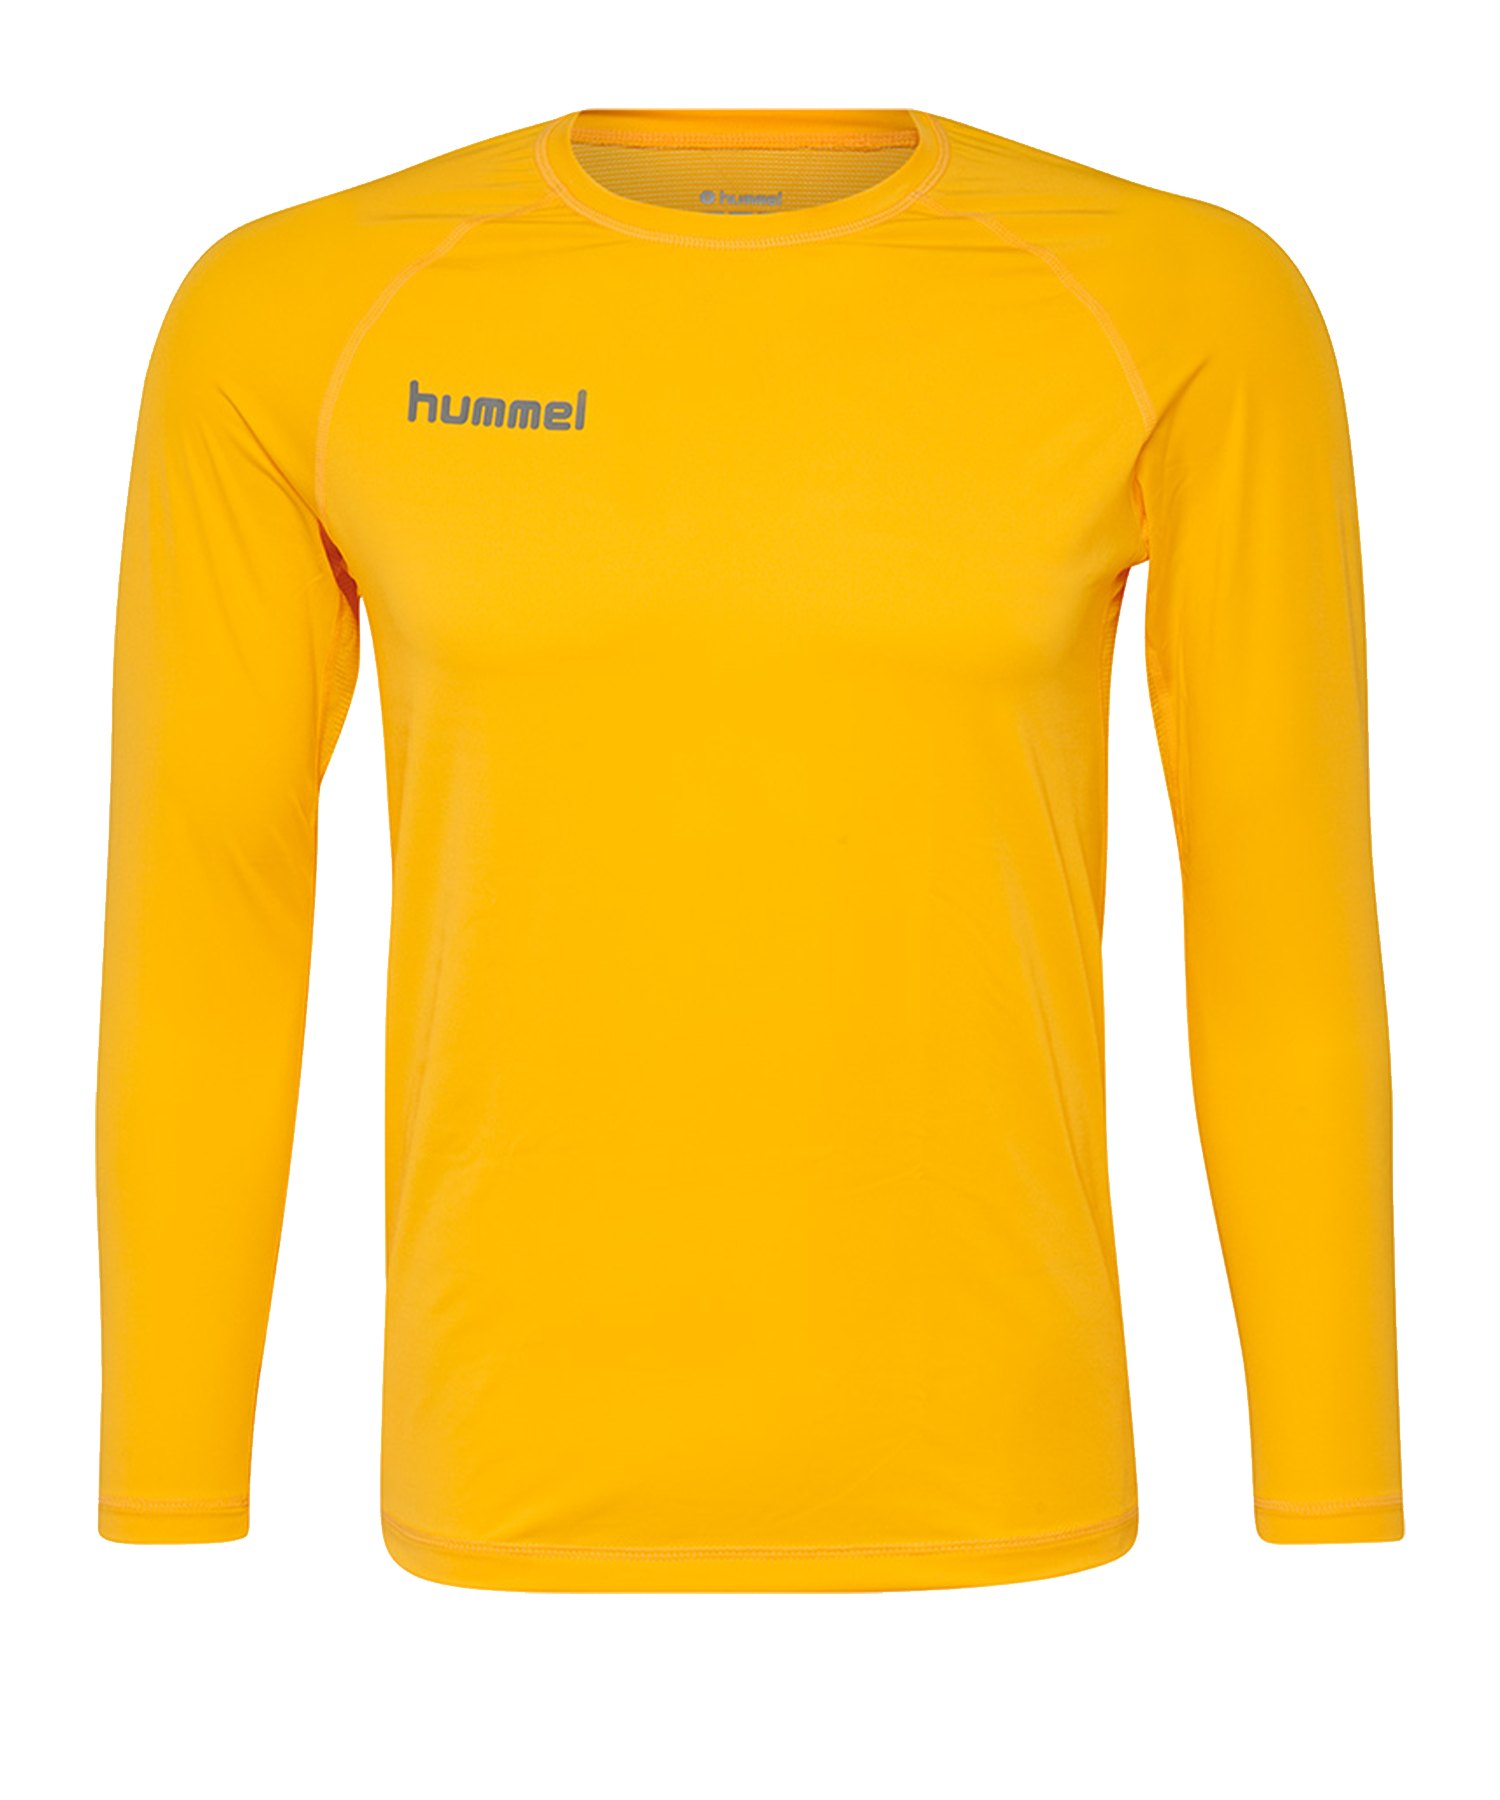 Hummel First Perform Langarm Kids Gelb F5001 - Gelb